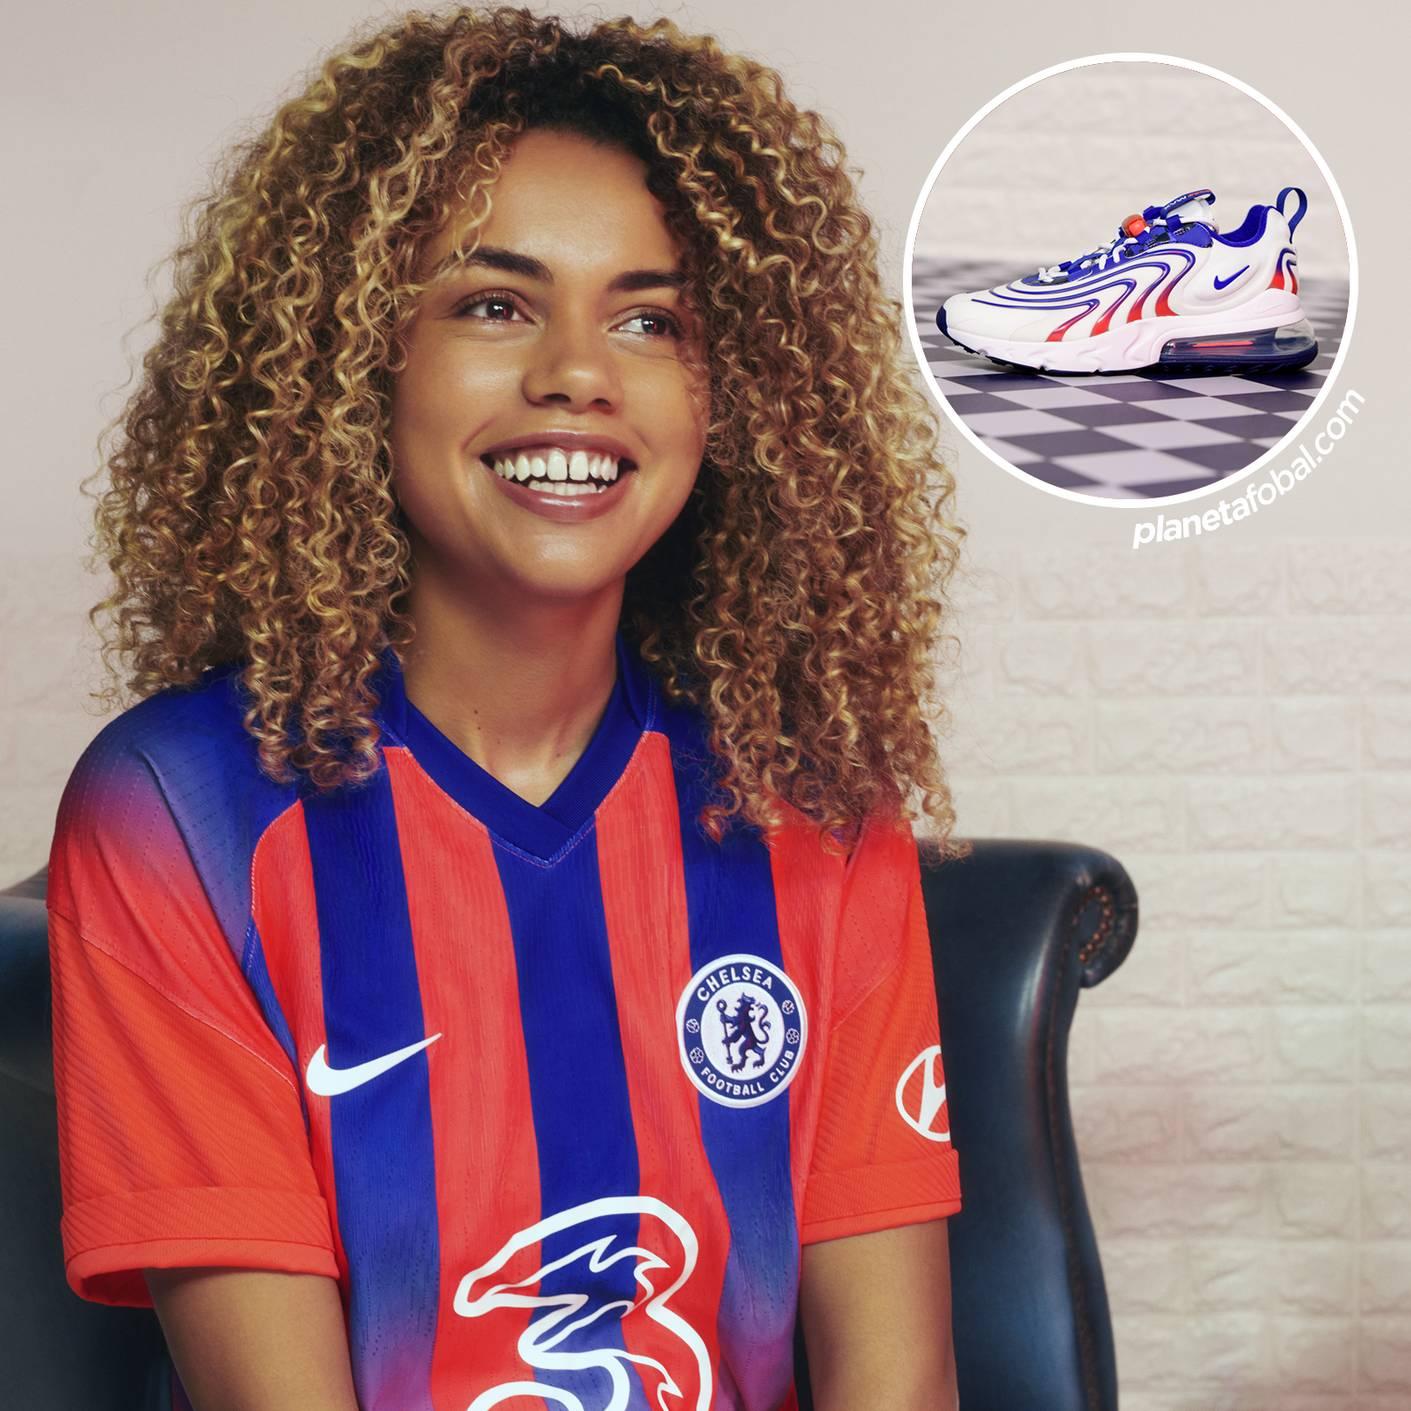 Chelsea / Air Max OG 180 | Imágenes Nike